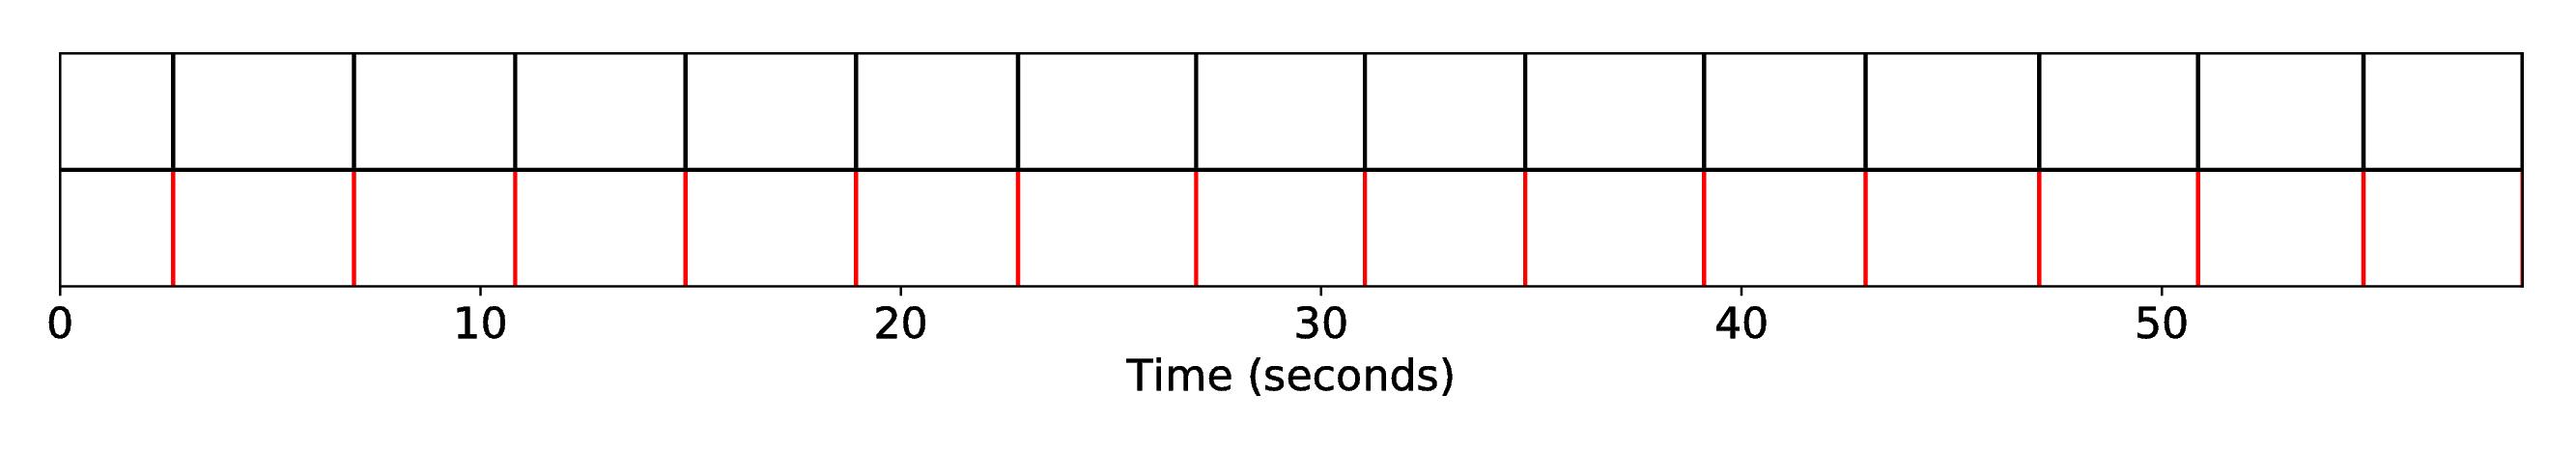 DP1_INT1_R-RW-Snore_m8__S-Fandango__SequenceAlignment